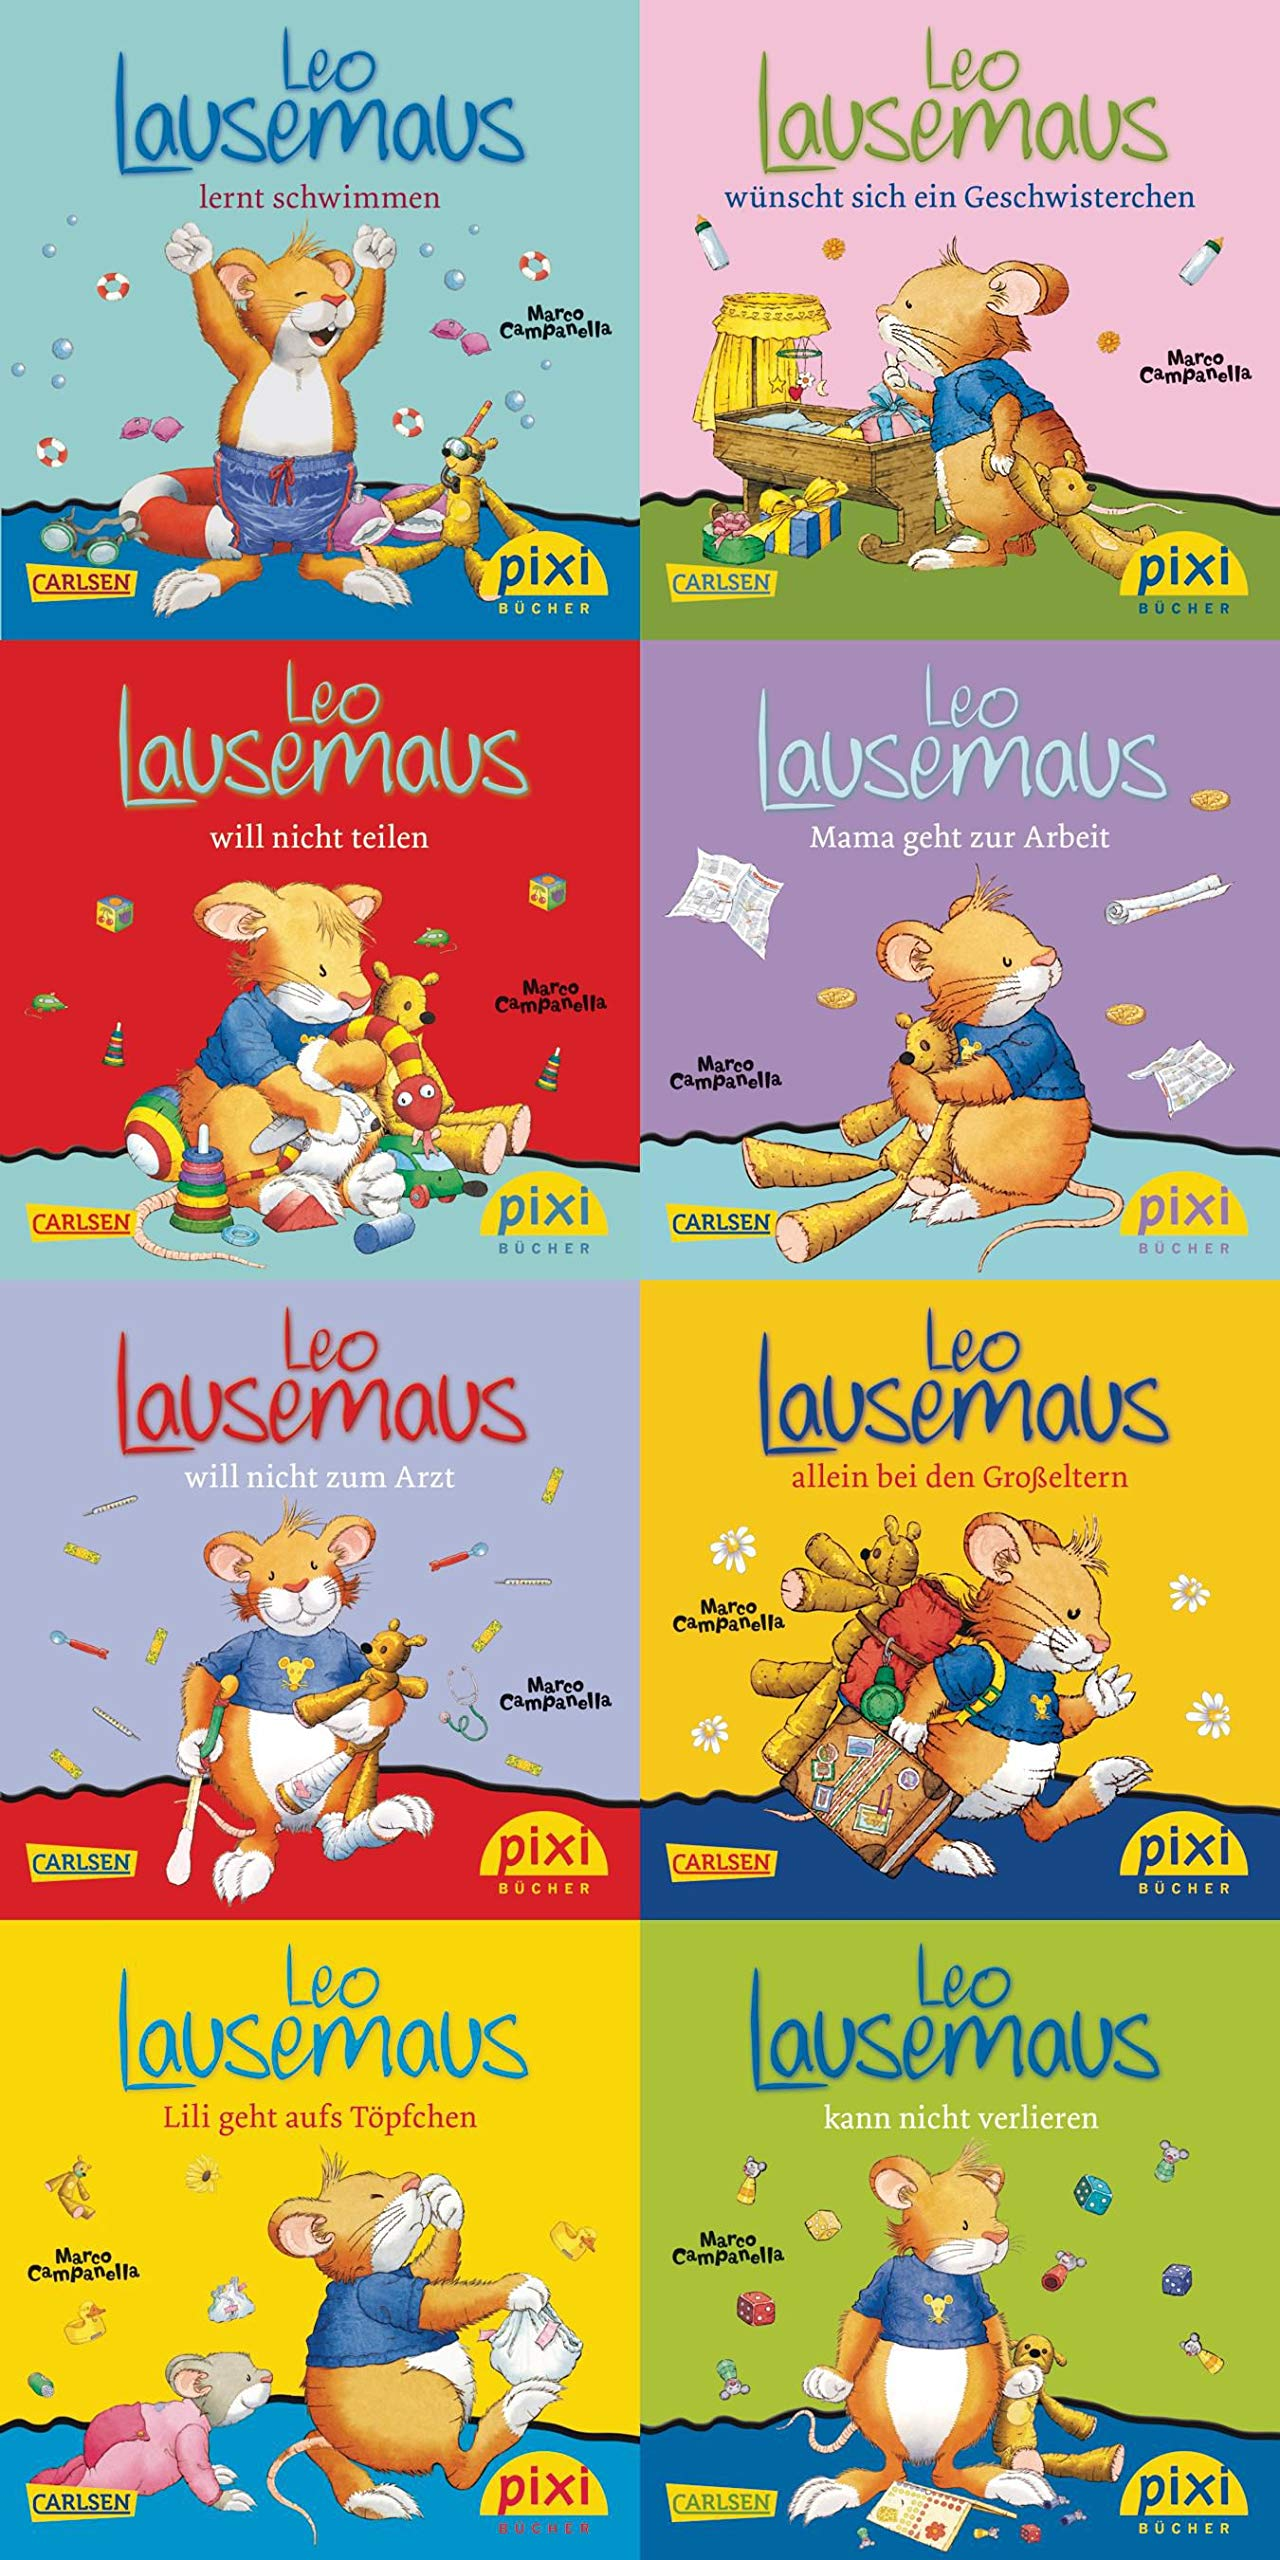 Pixi-8er-Set 219: Leo Lausemaus (8x1 Exemplar) (219)